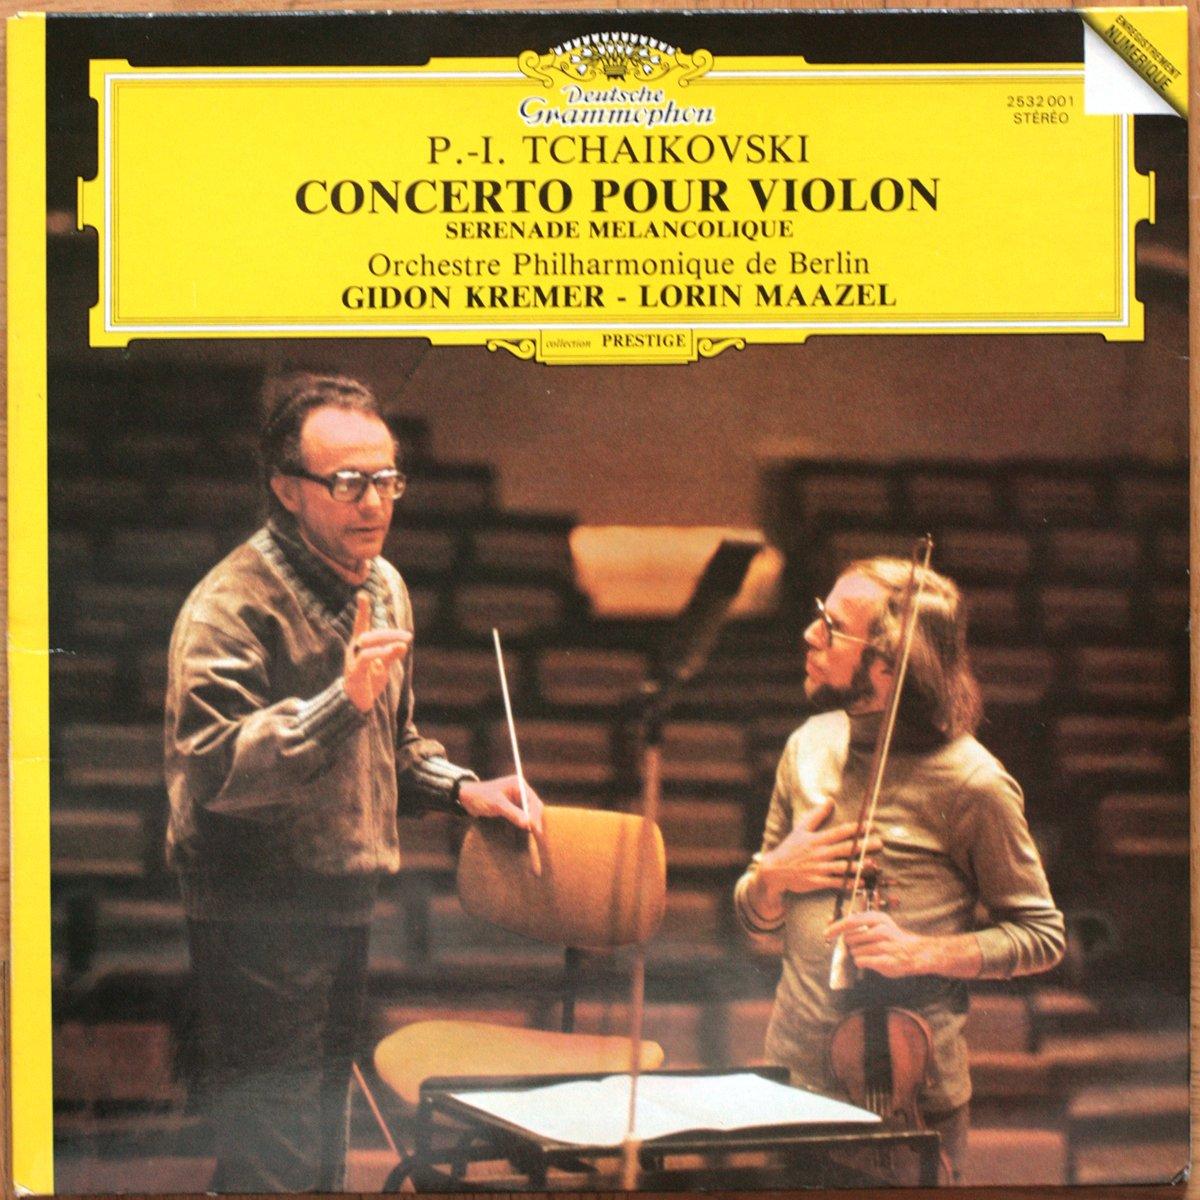 DGG 2532001 Tchaikovsky Concerto Violon Kremer Maazel